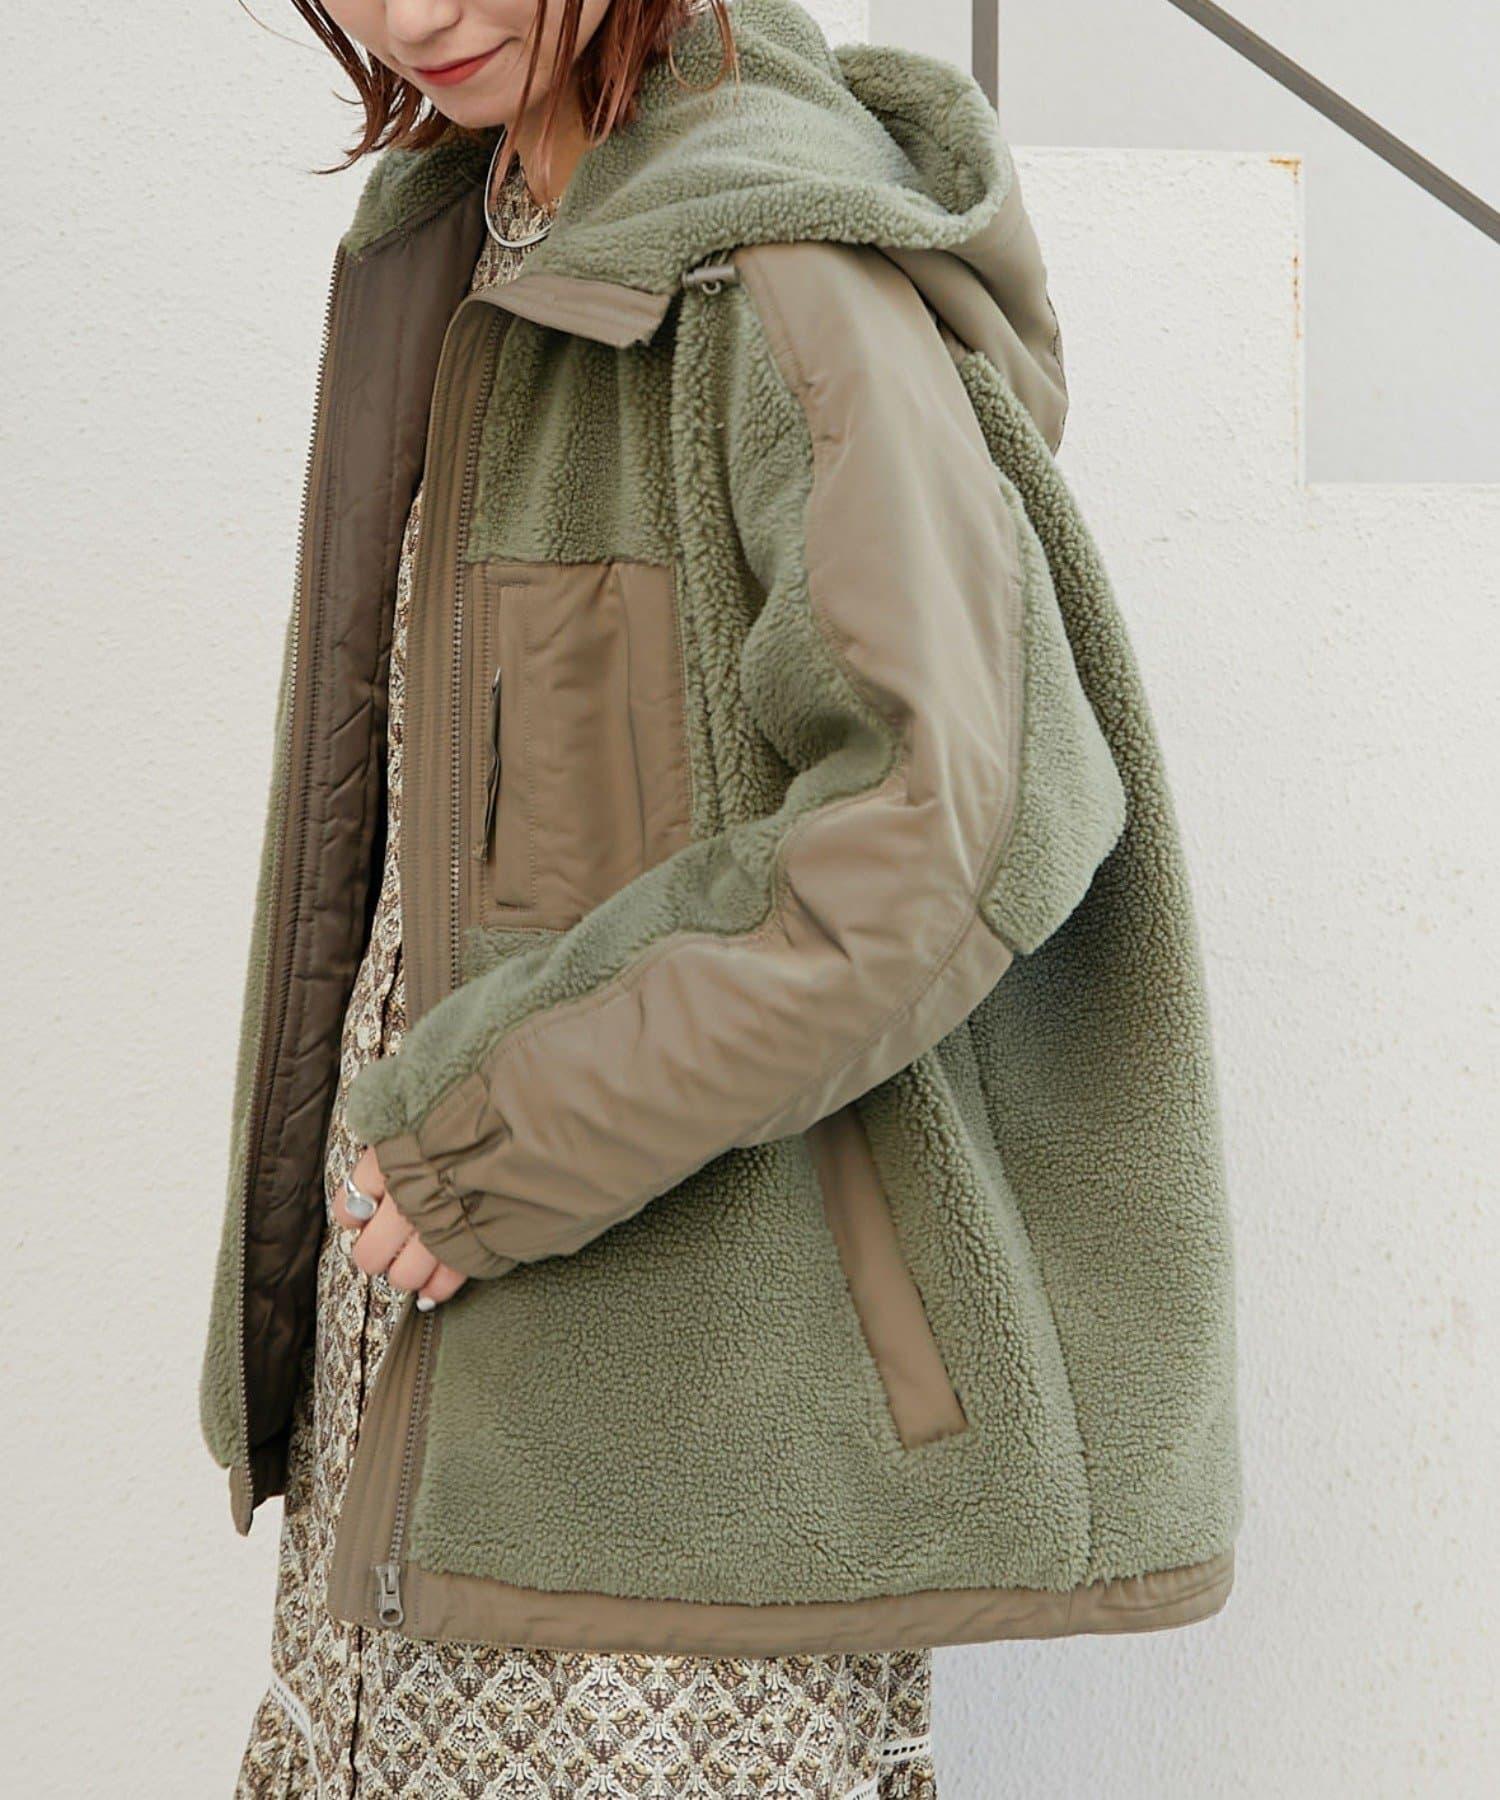 CIAOPANIC TYPY(チャオパニックティピー) ボア切替フードジャケット